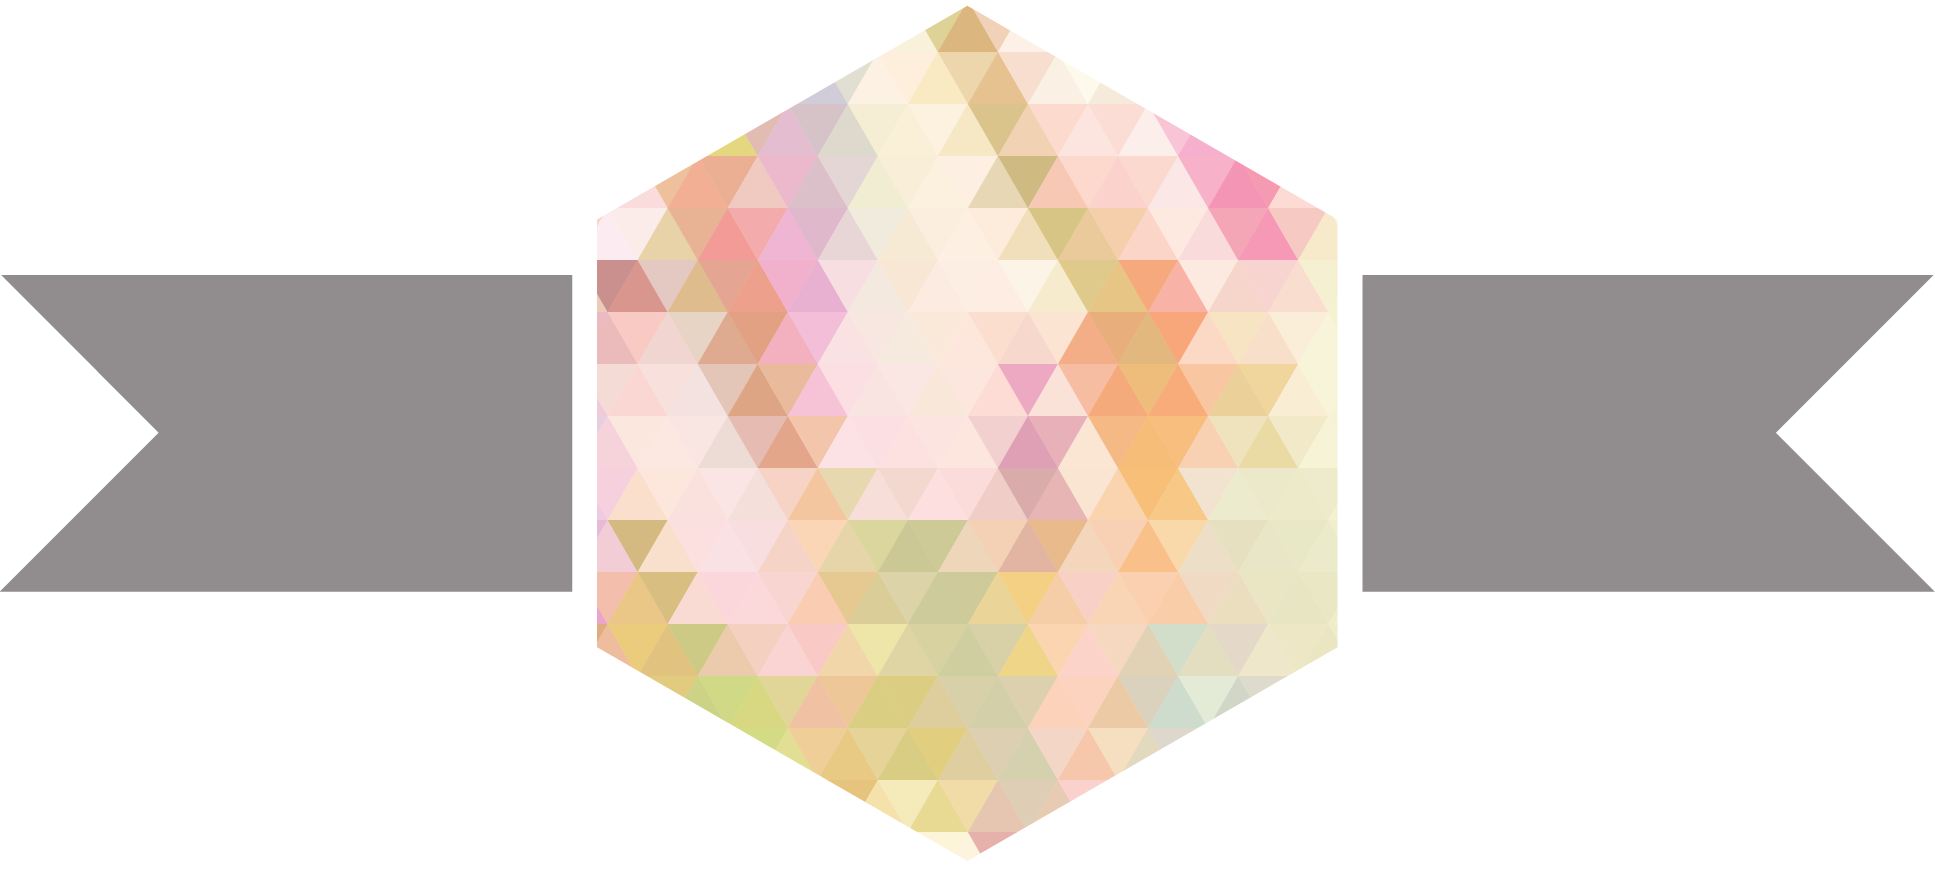 logo image pixelated.png